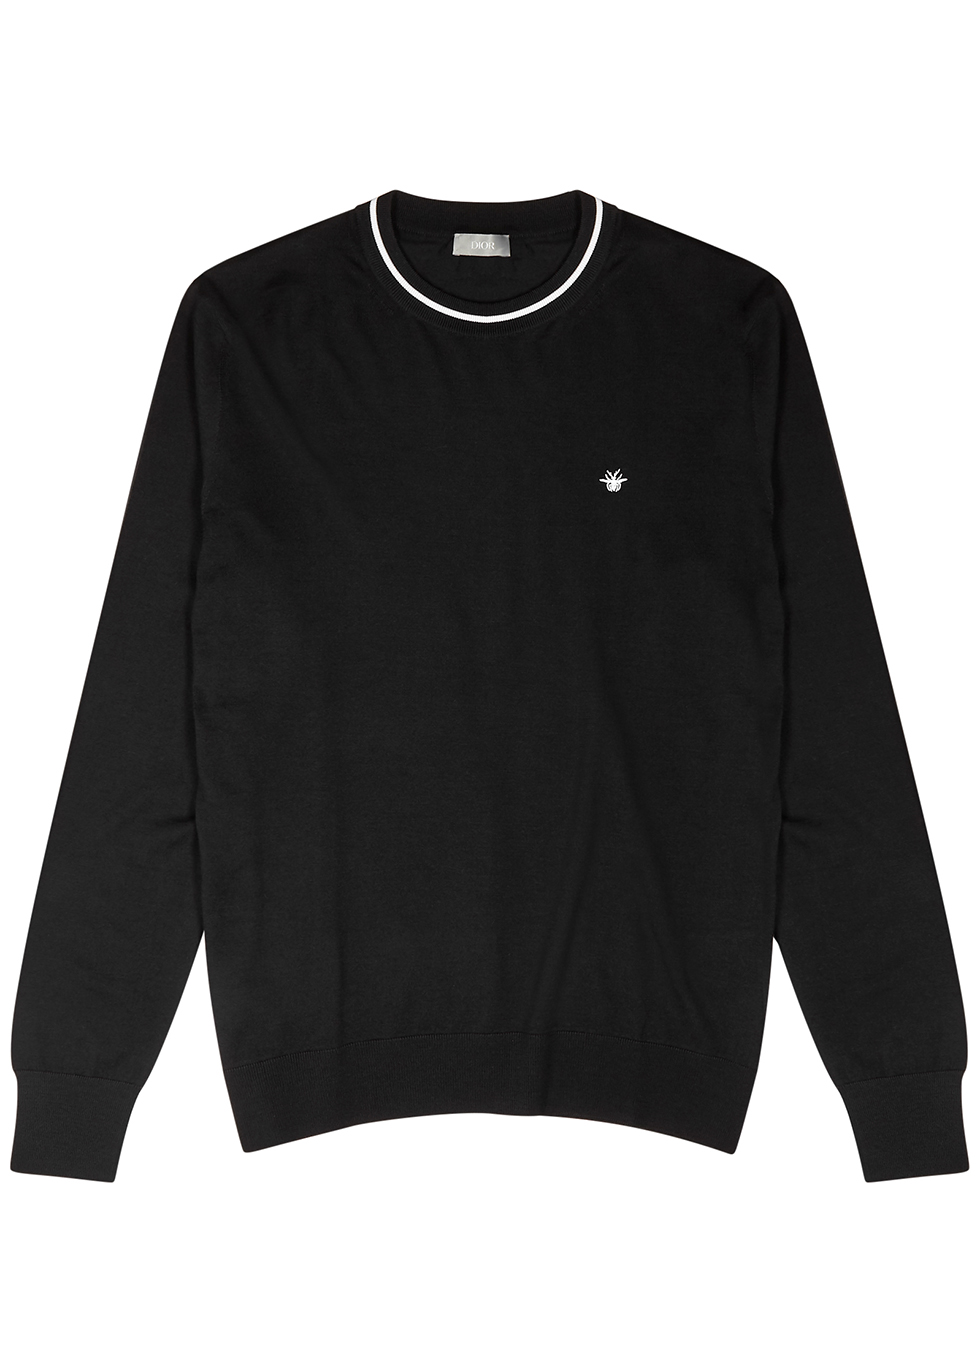 5f0304147 Dior Homme T-Shirts, Polo Shirts, Jackets, Scarves - Harvey Nichols